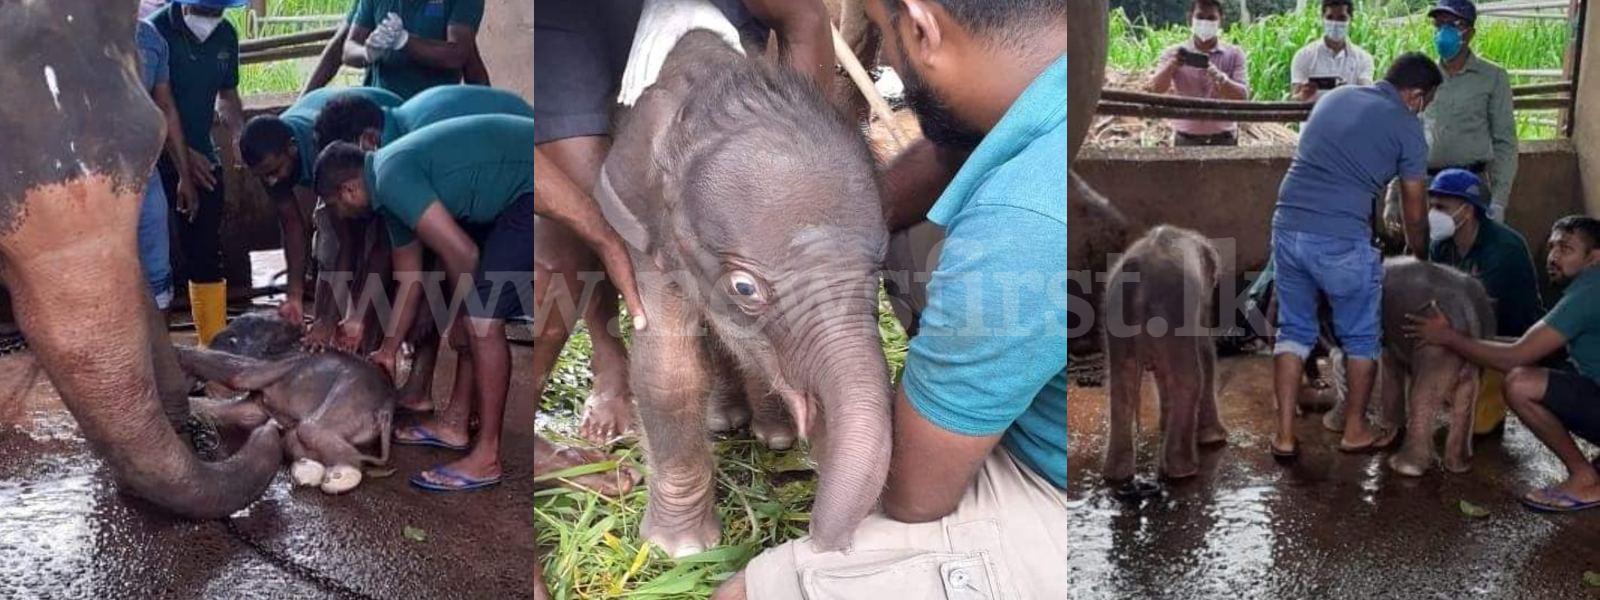 Elephant gives birth to twins at Pinnawala Elephant Orphanage